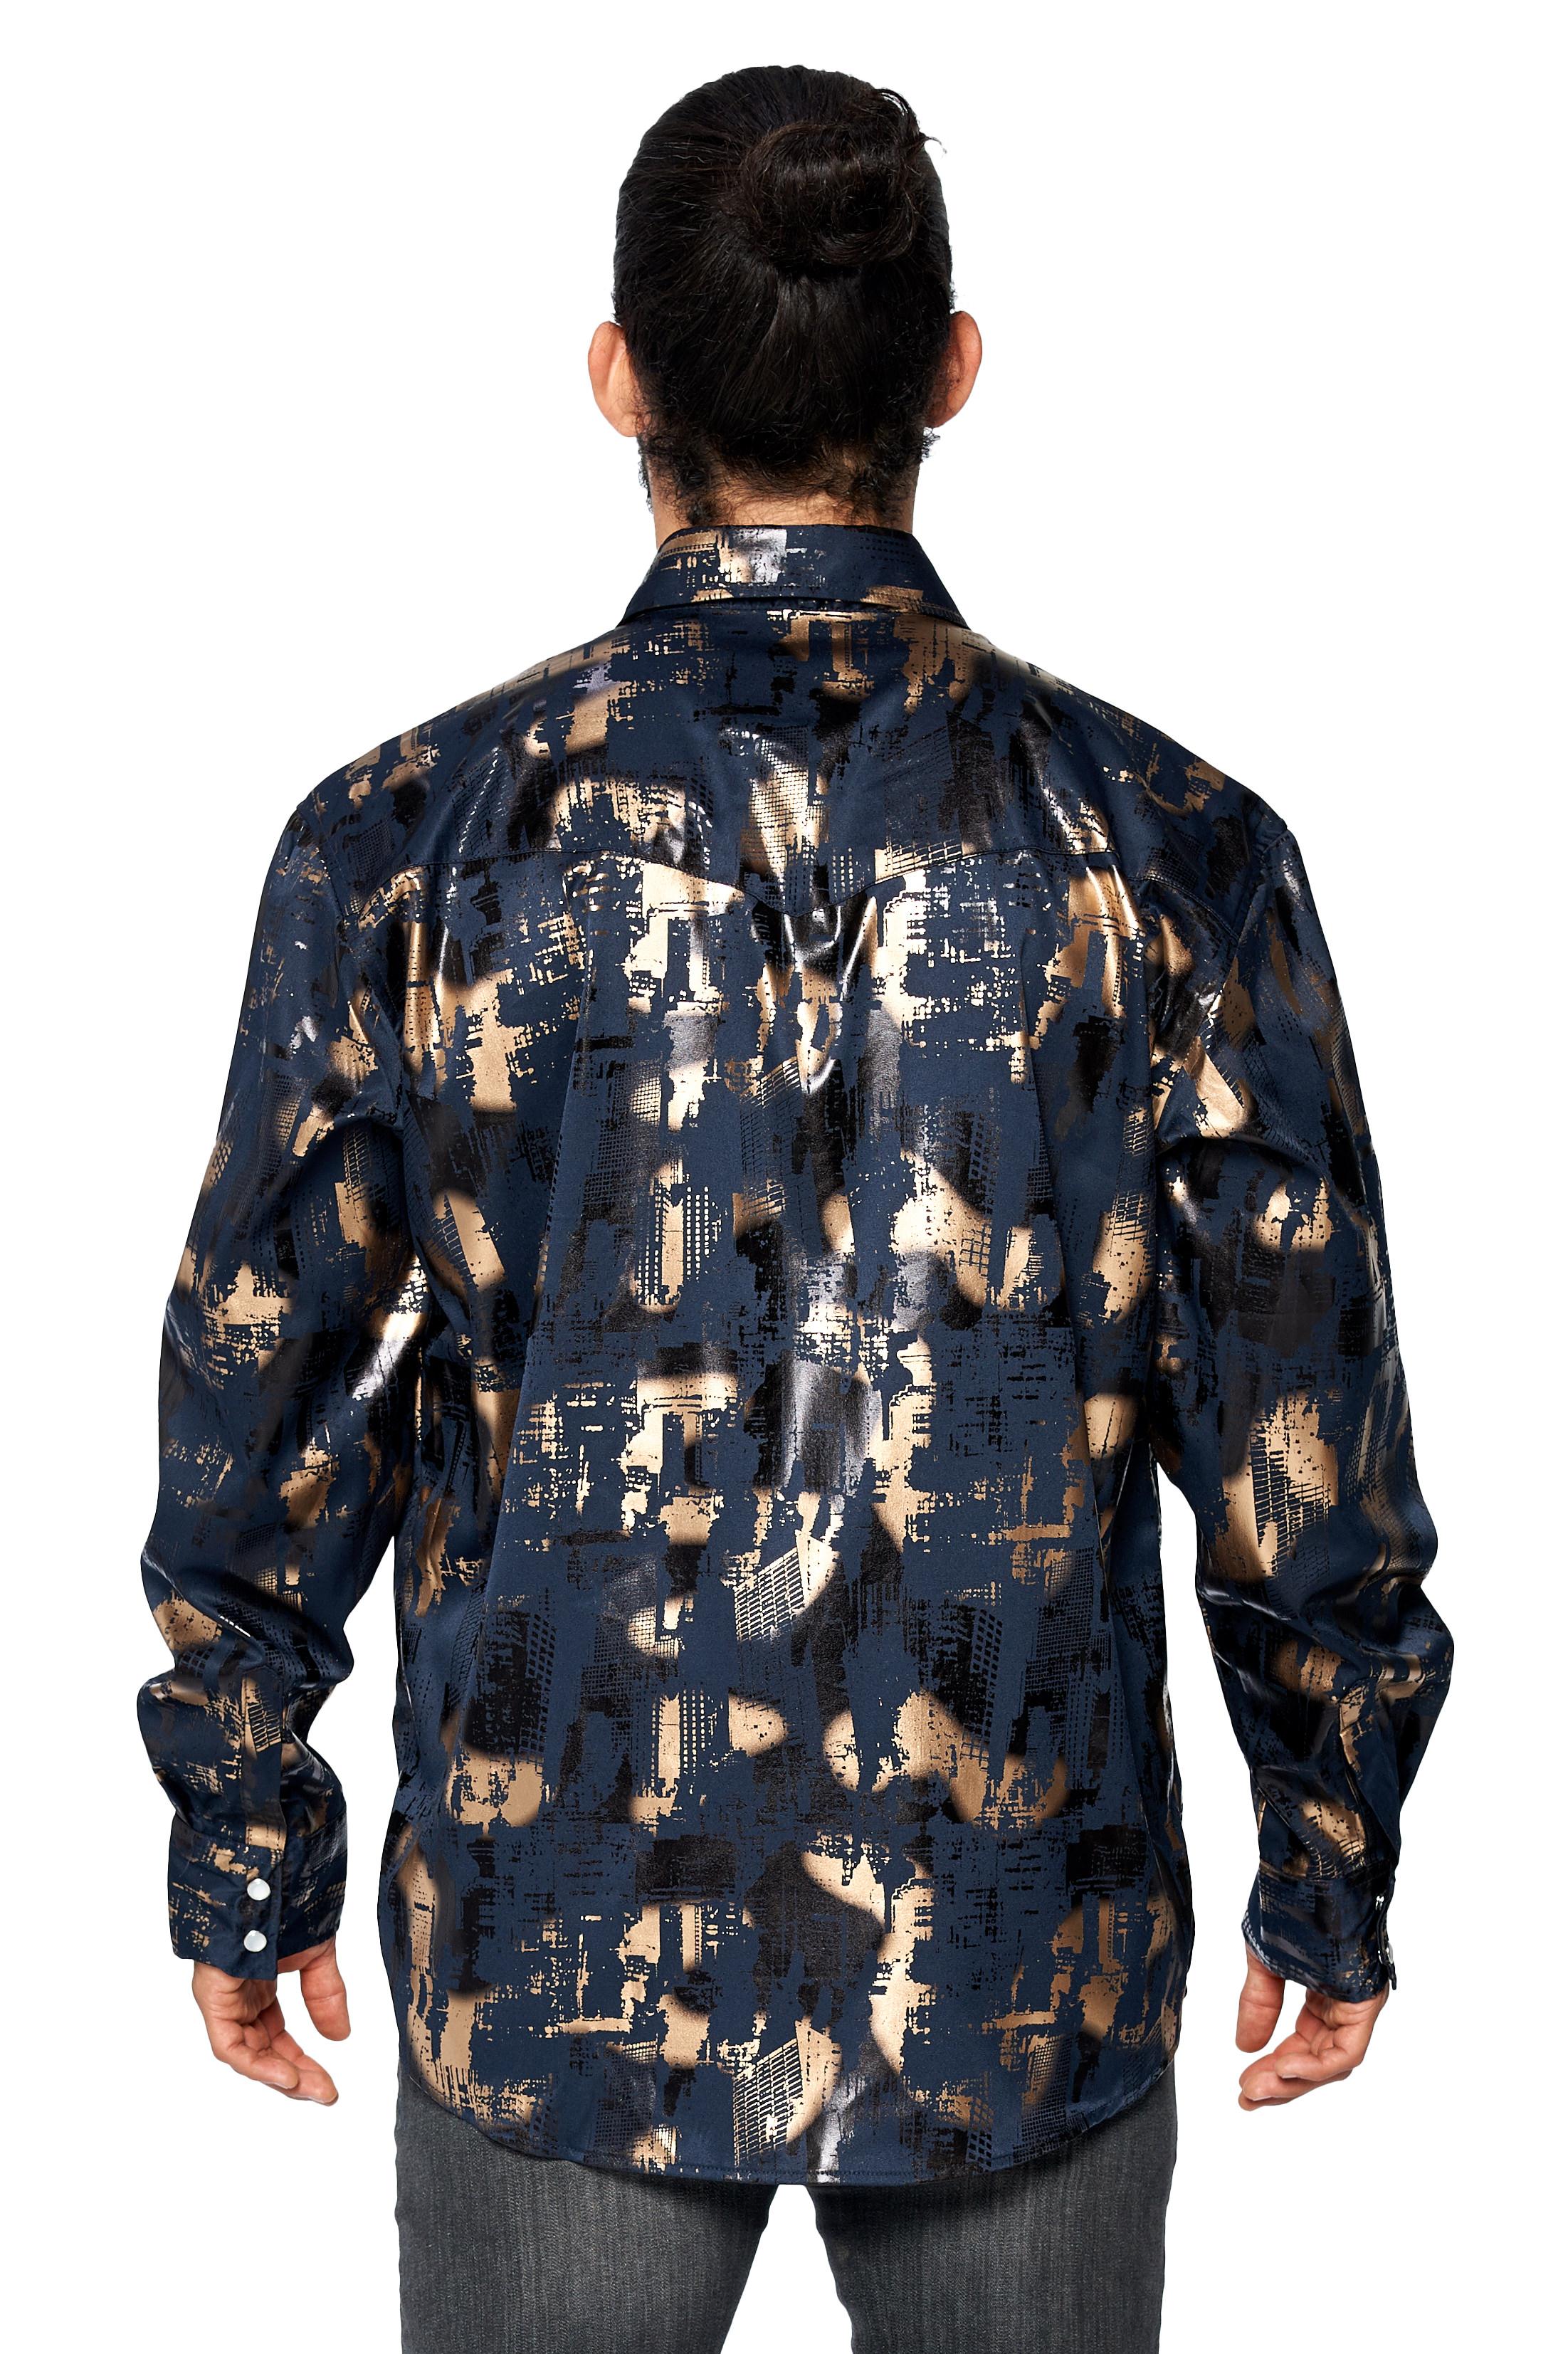 LW-Men-039-s-Pearl-Snap-Tribal-Stylish-Printed-Woven-Western-Vaquero-Rodeo-Shirt thumbnail 25